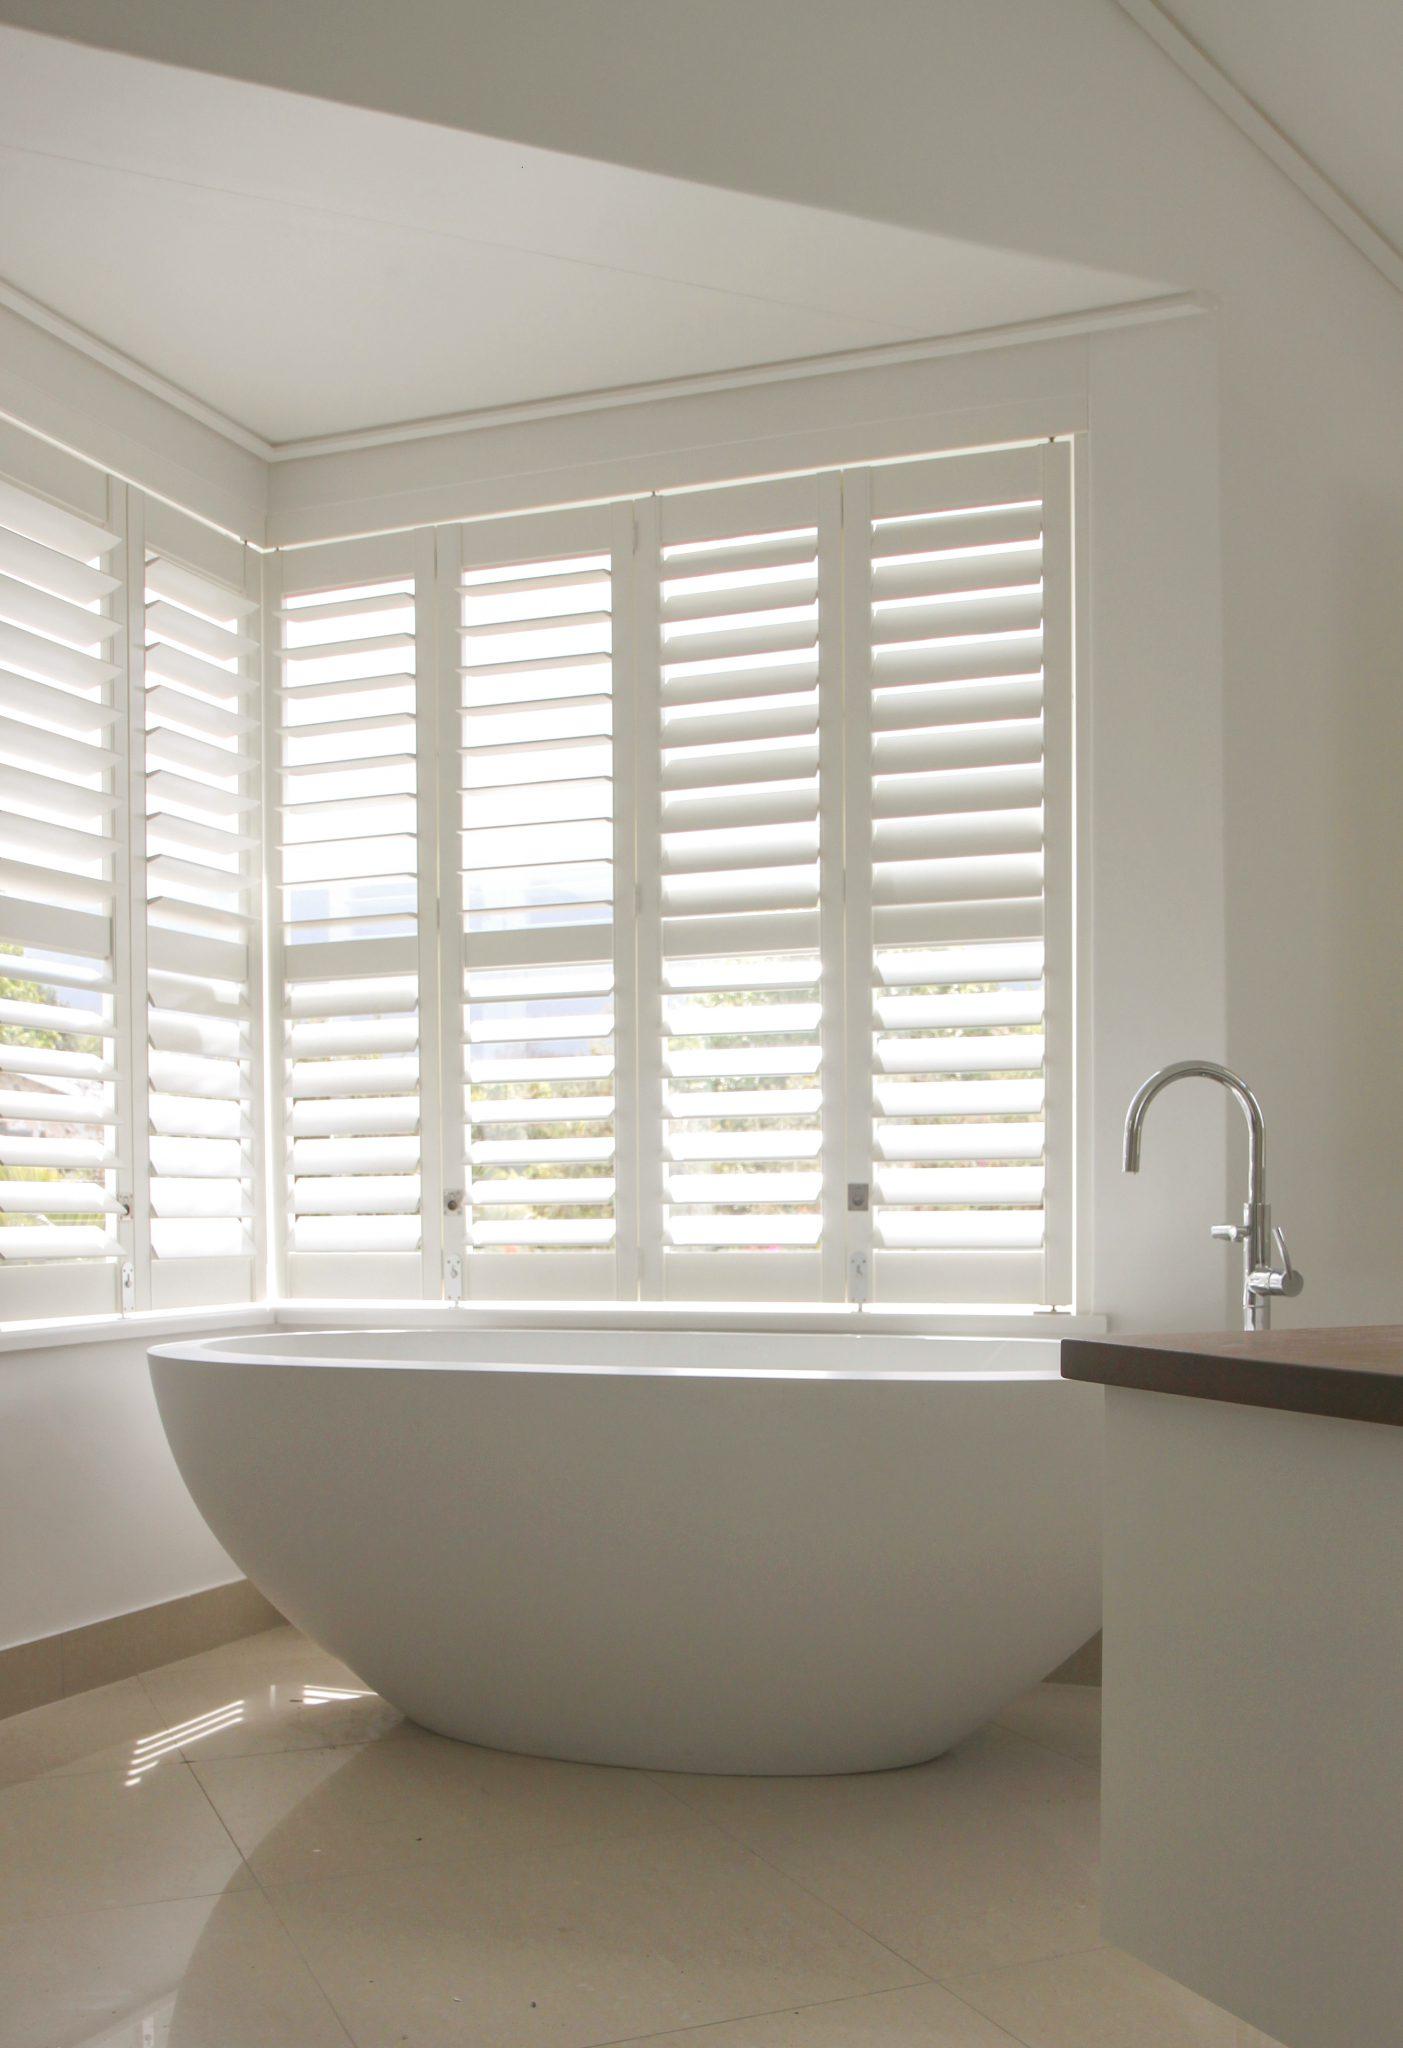 Waterproof Shutters For Bathroom or Shower Window Java